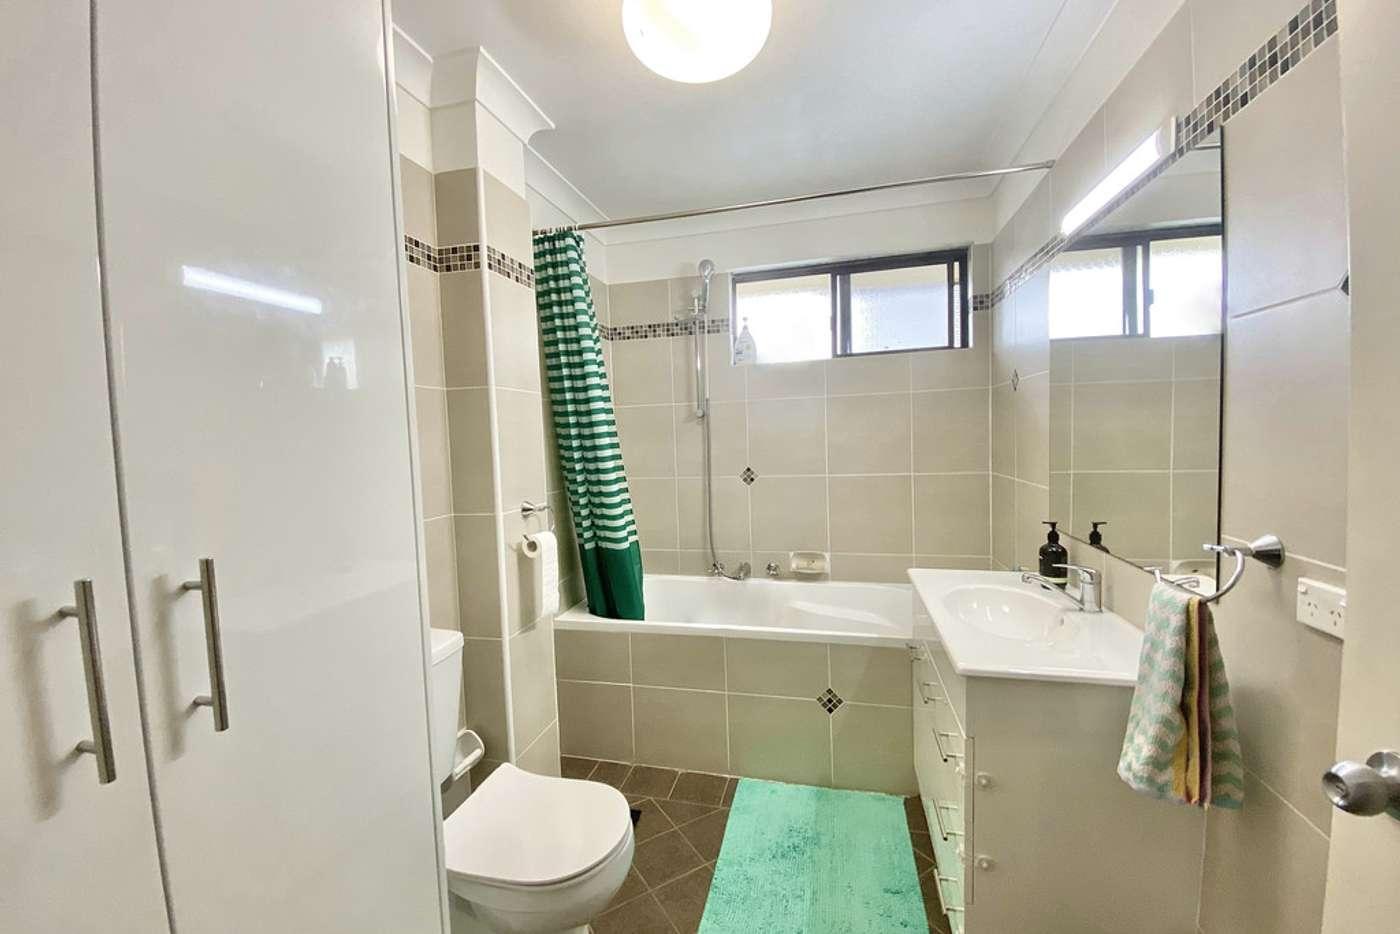 Sixth view of Homely unit listing, 10/83-85 Saddington Street, St Marys NSW 2760